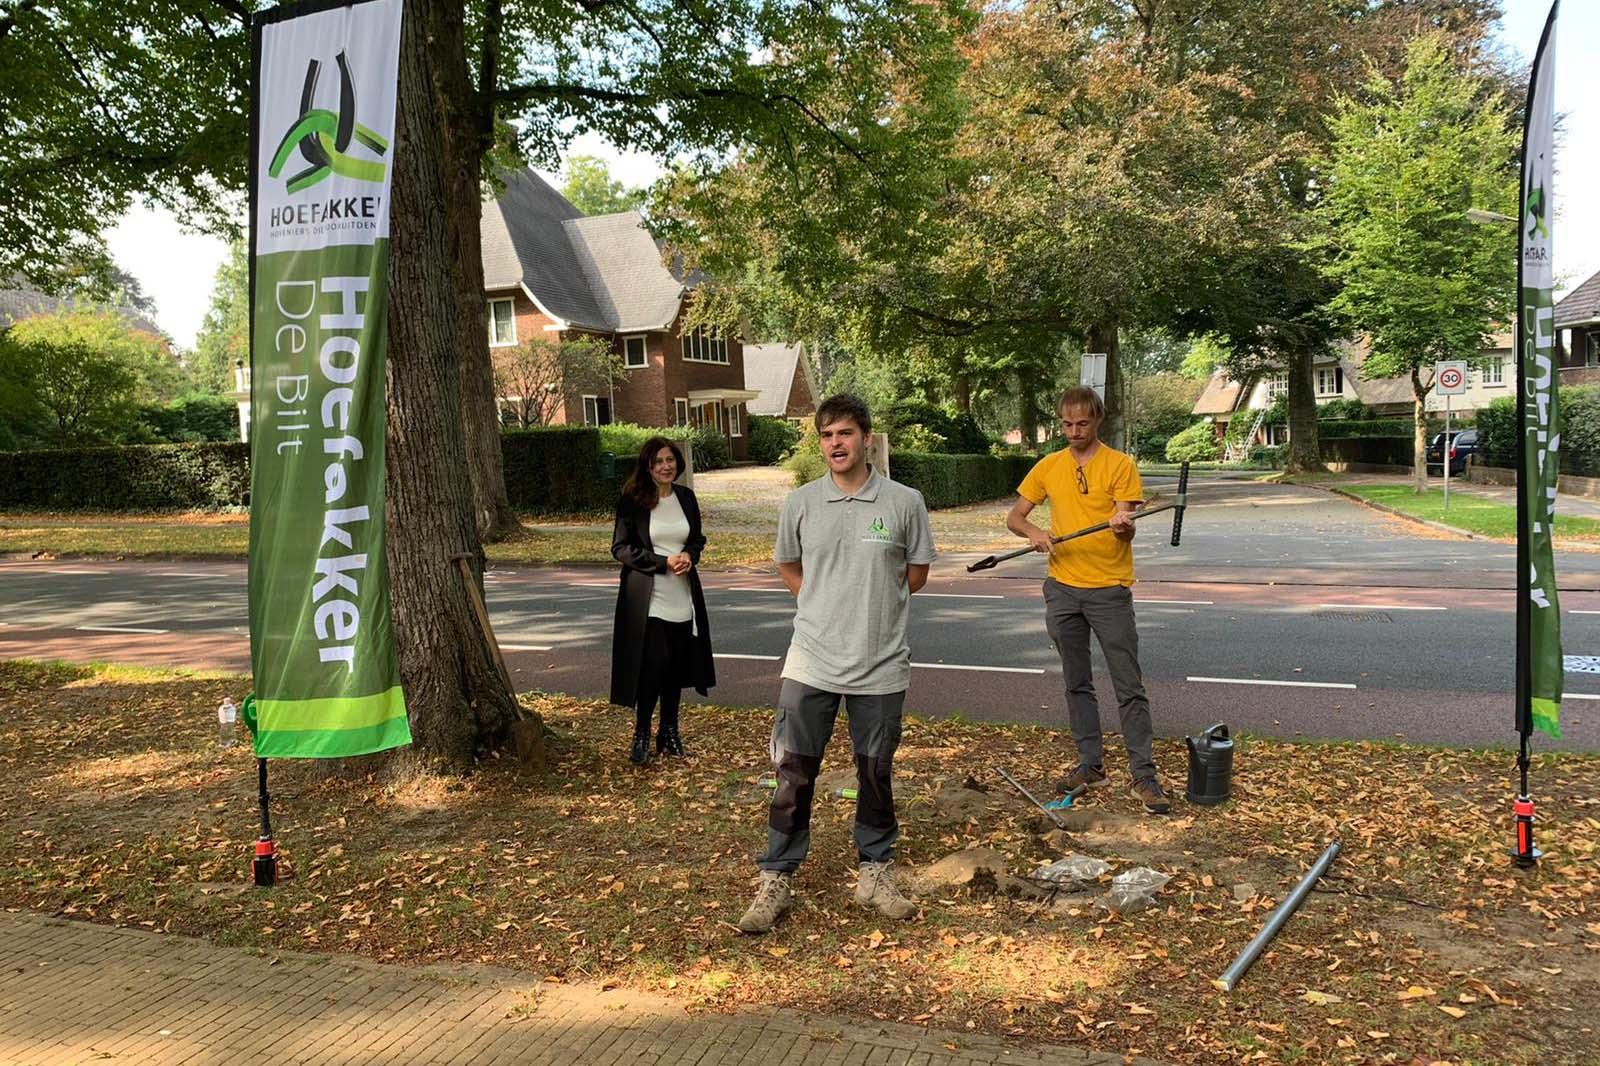 Hoefakker levert Smart City oplossing EU project SCOREwater Amersfoort